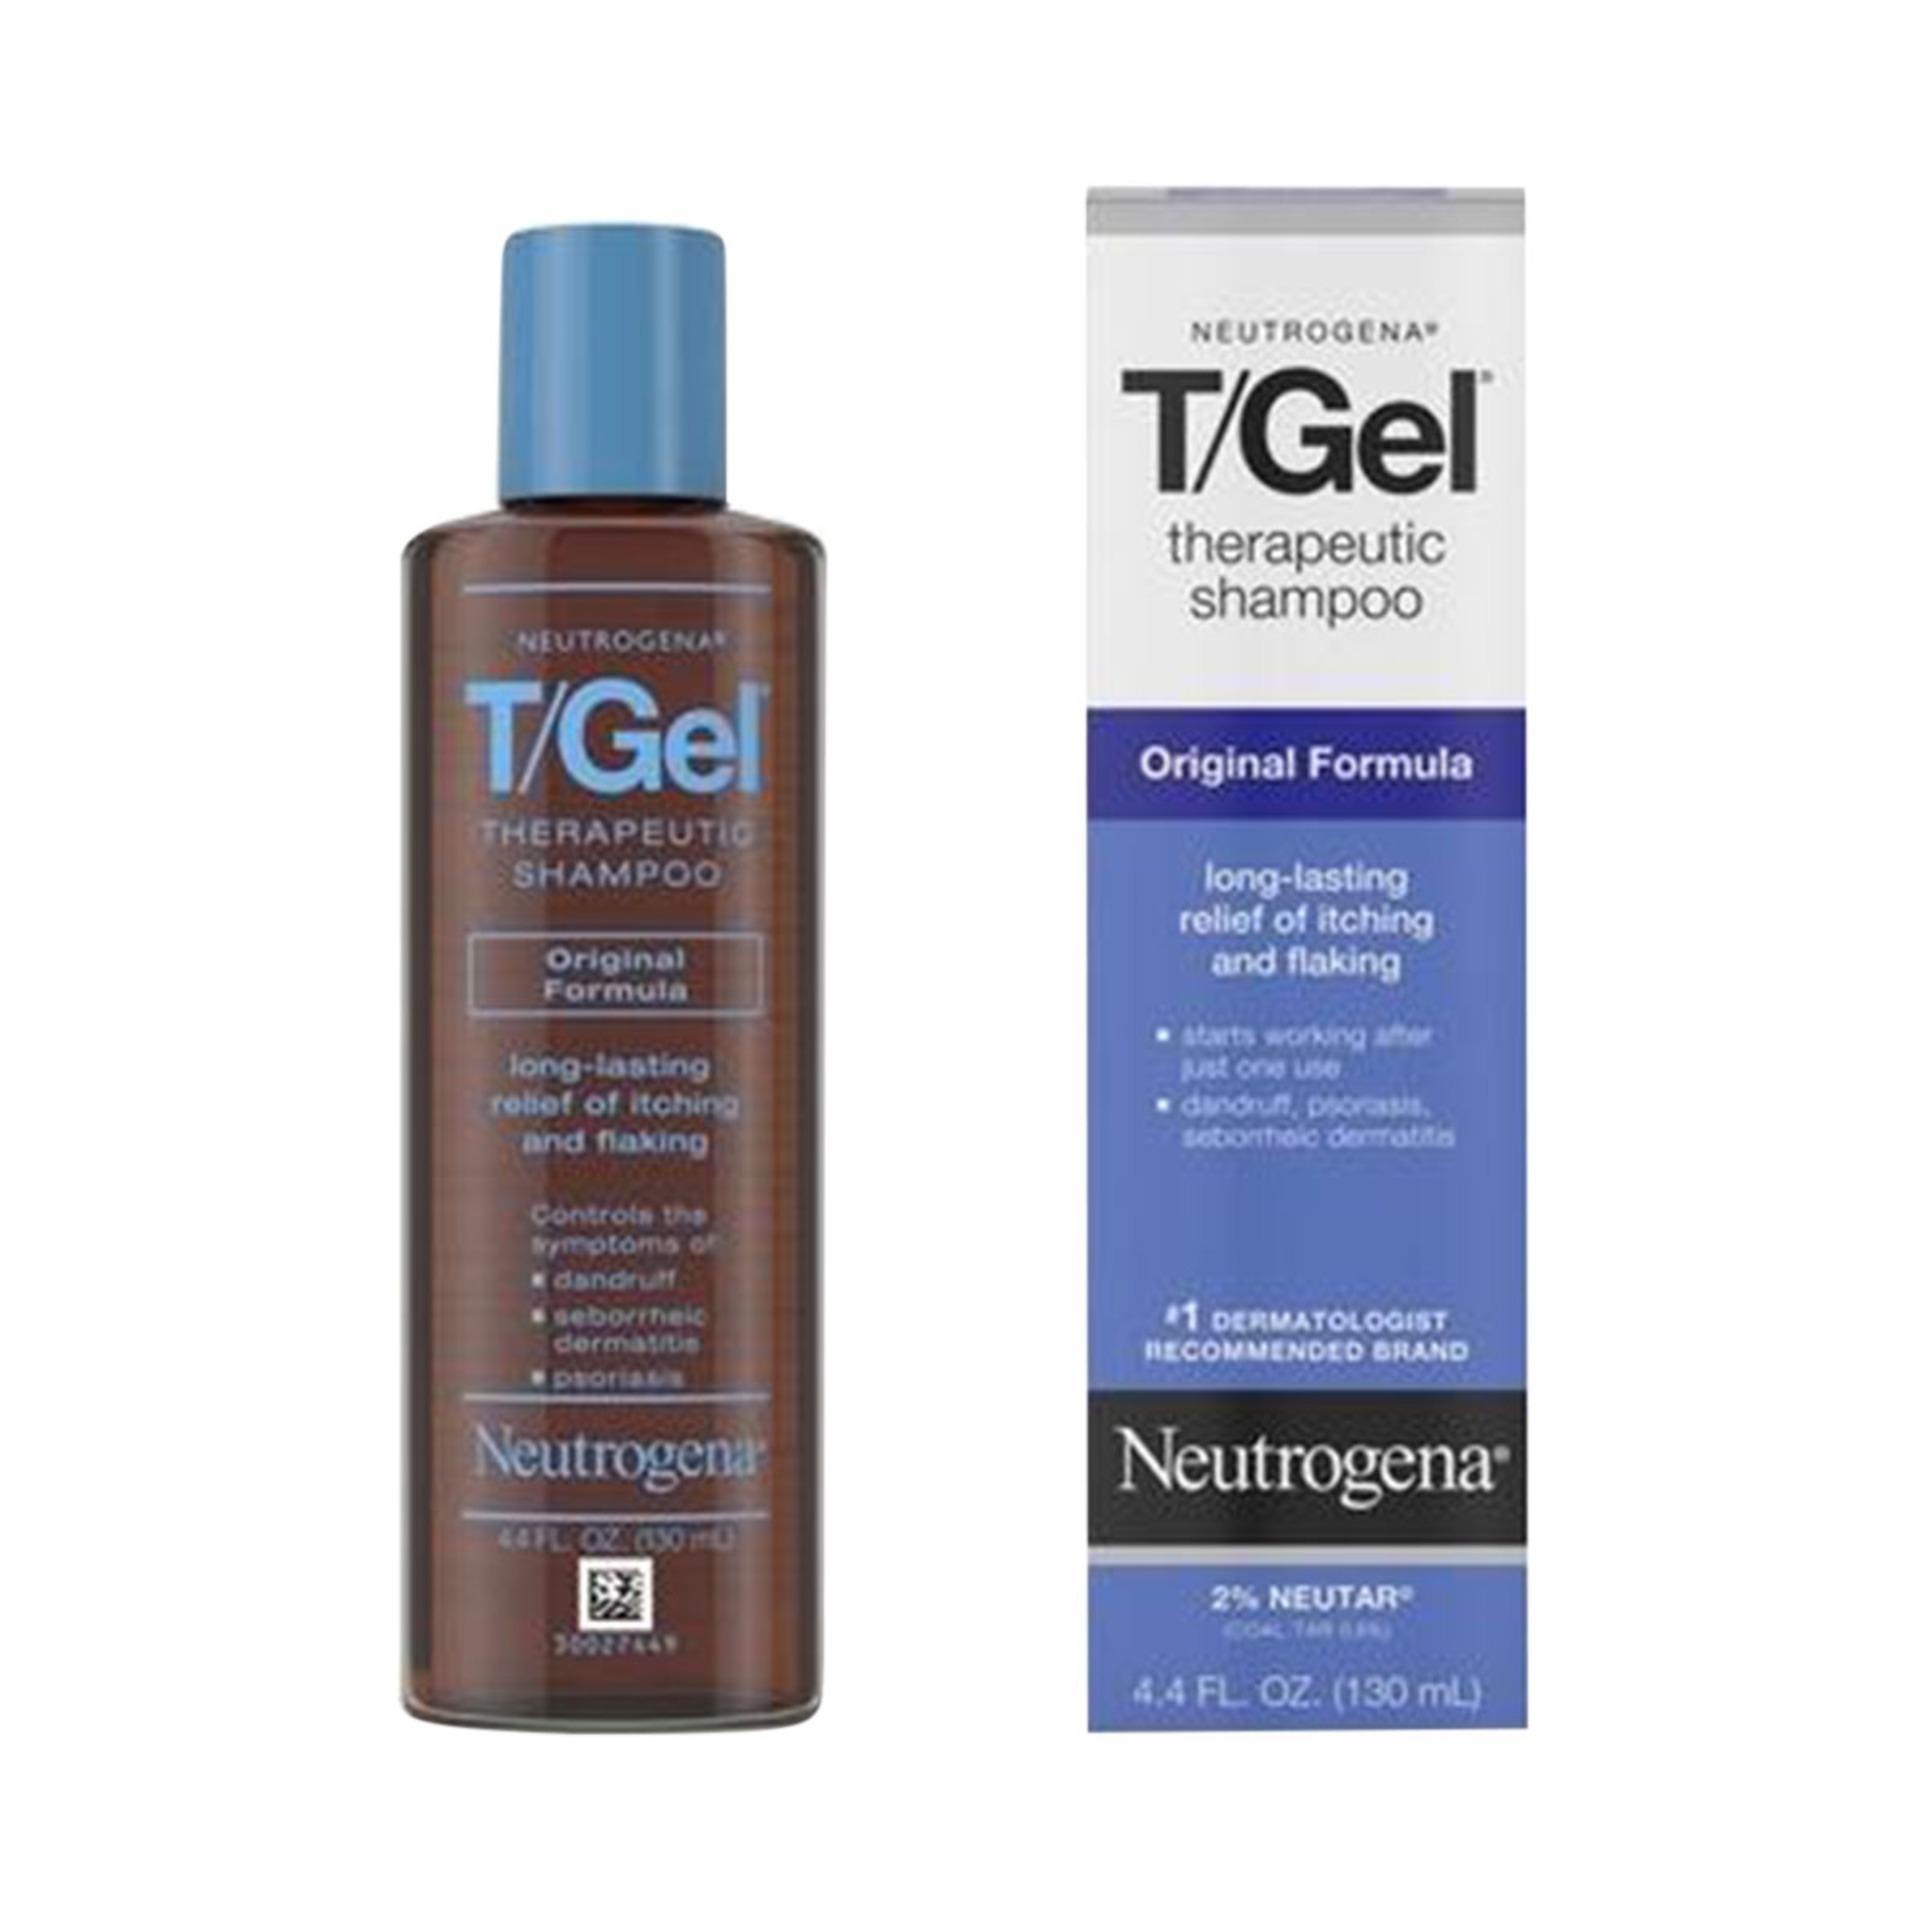 Neutrogena Buy At Best Price In Bangladesh Daraz Listerine Multi Protect Zero 250ml Free 80ml T Gel Therapeutic Shampoo Original Formula Anti Dandruff Treatment 130ml